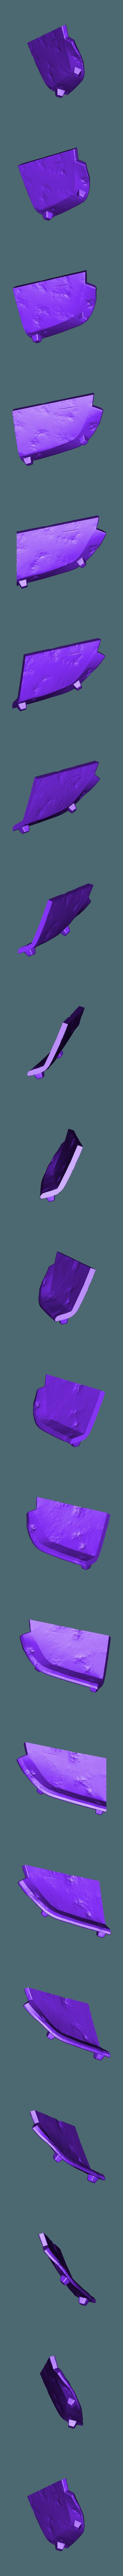 Armory_Damaged_Print19.obj Download OBJ file Armory - Knights of Ren Helmet (damaged), 3D print model • 3D print design, 3D-mon